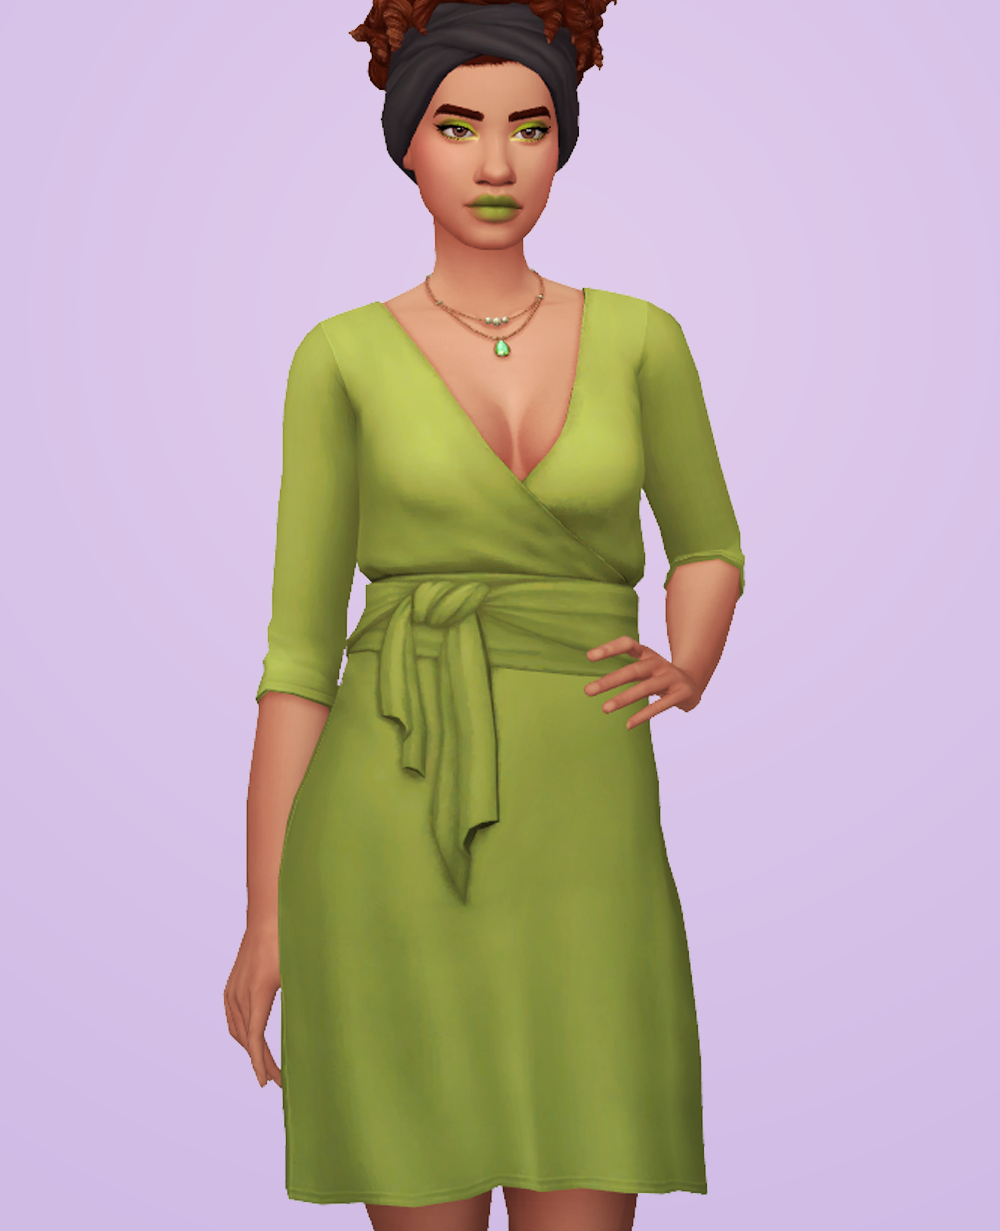 Lana cc finds sims 3